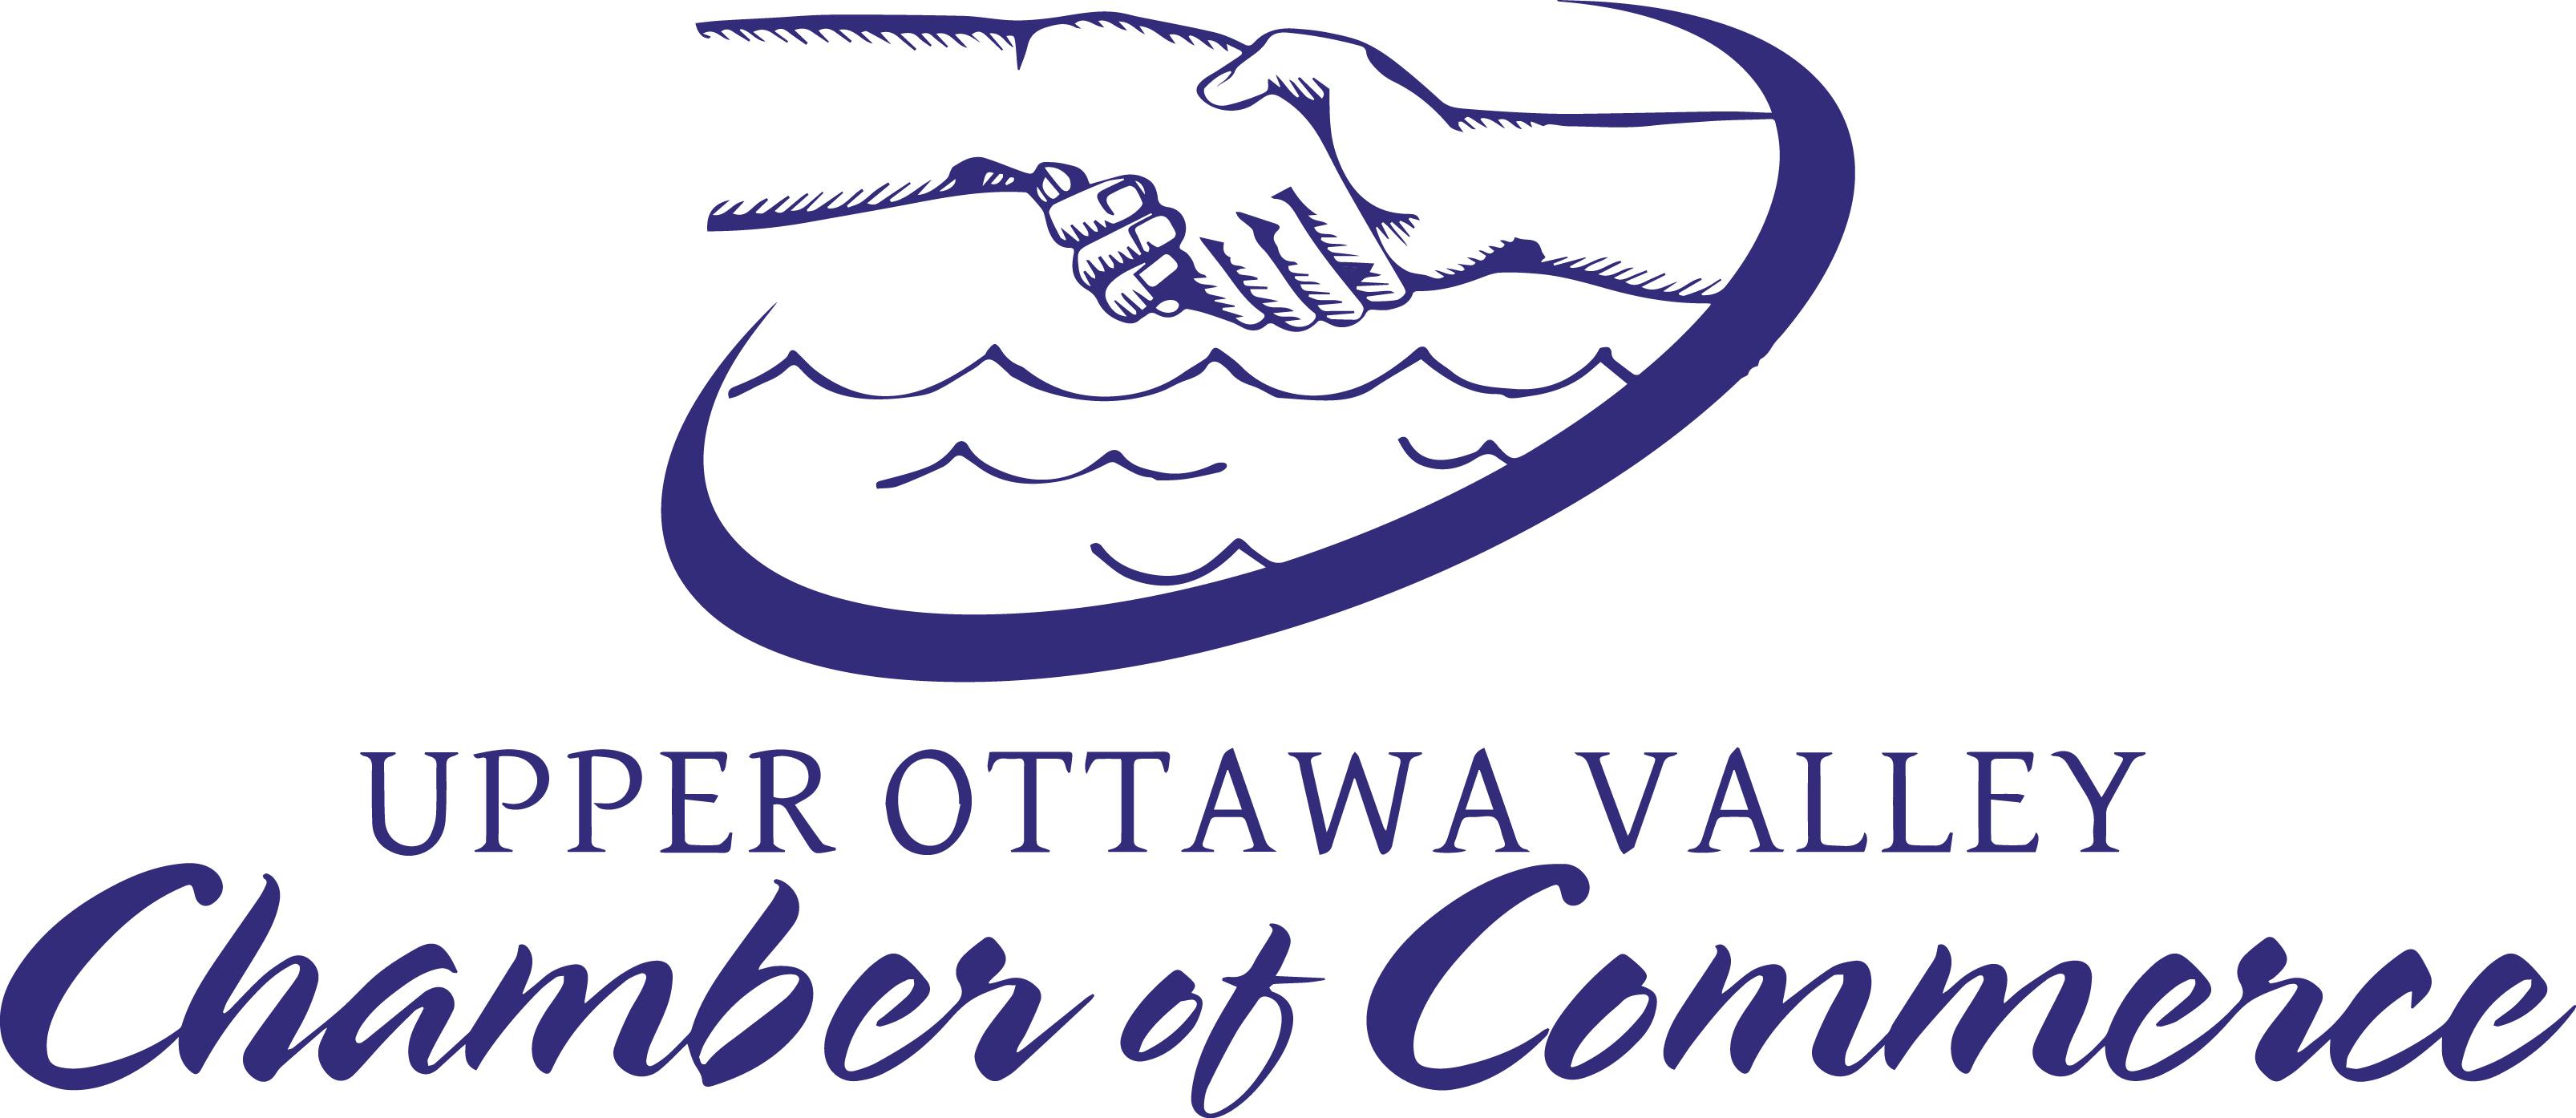 Upper Ottawa Valley Chamber of Commerce